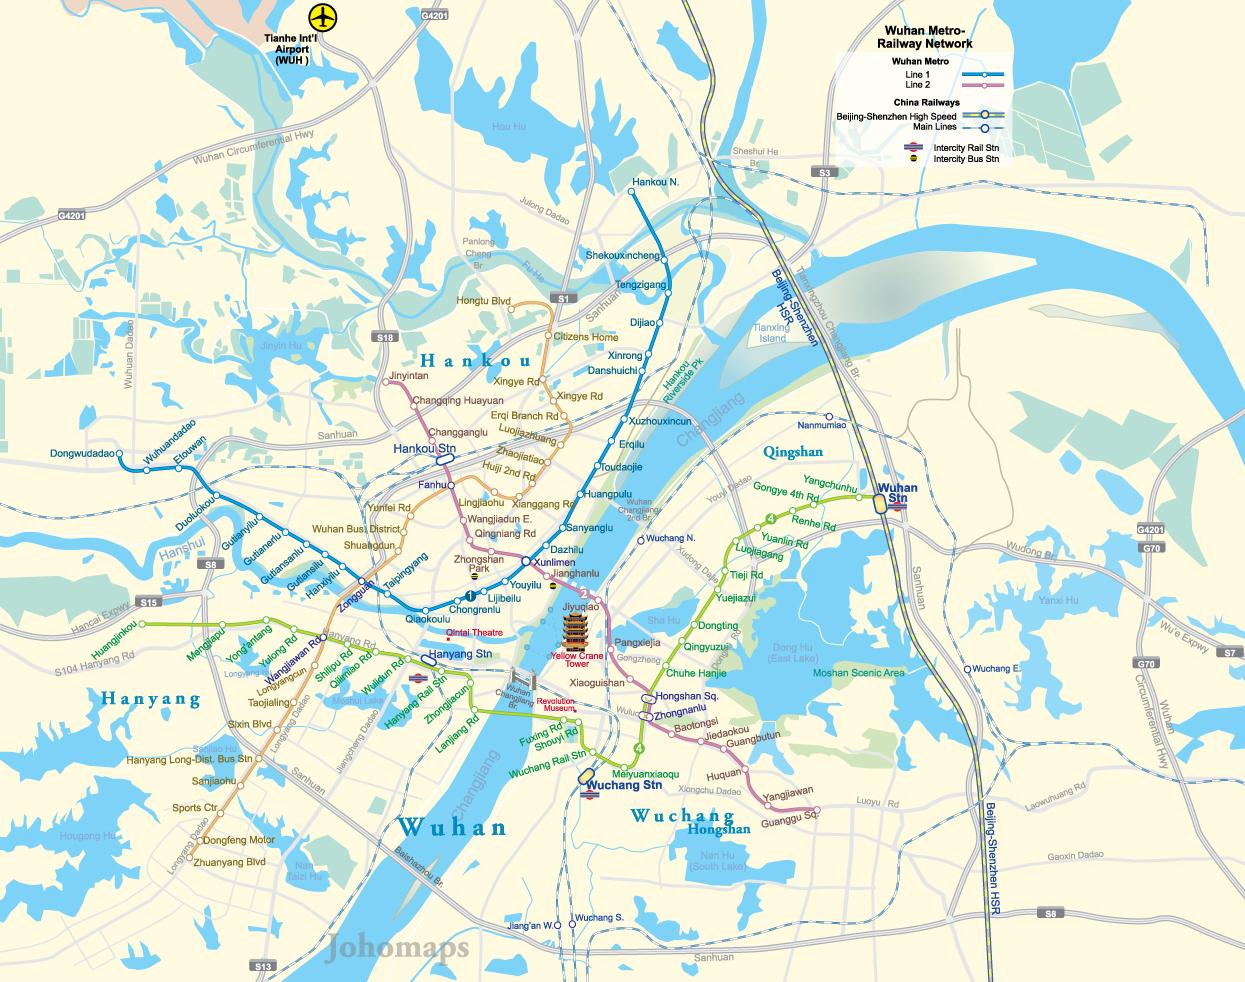 Metro Map of Wuhan JohoMaps